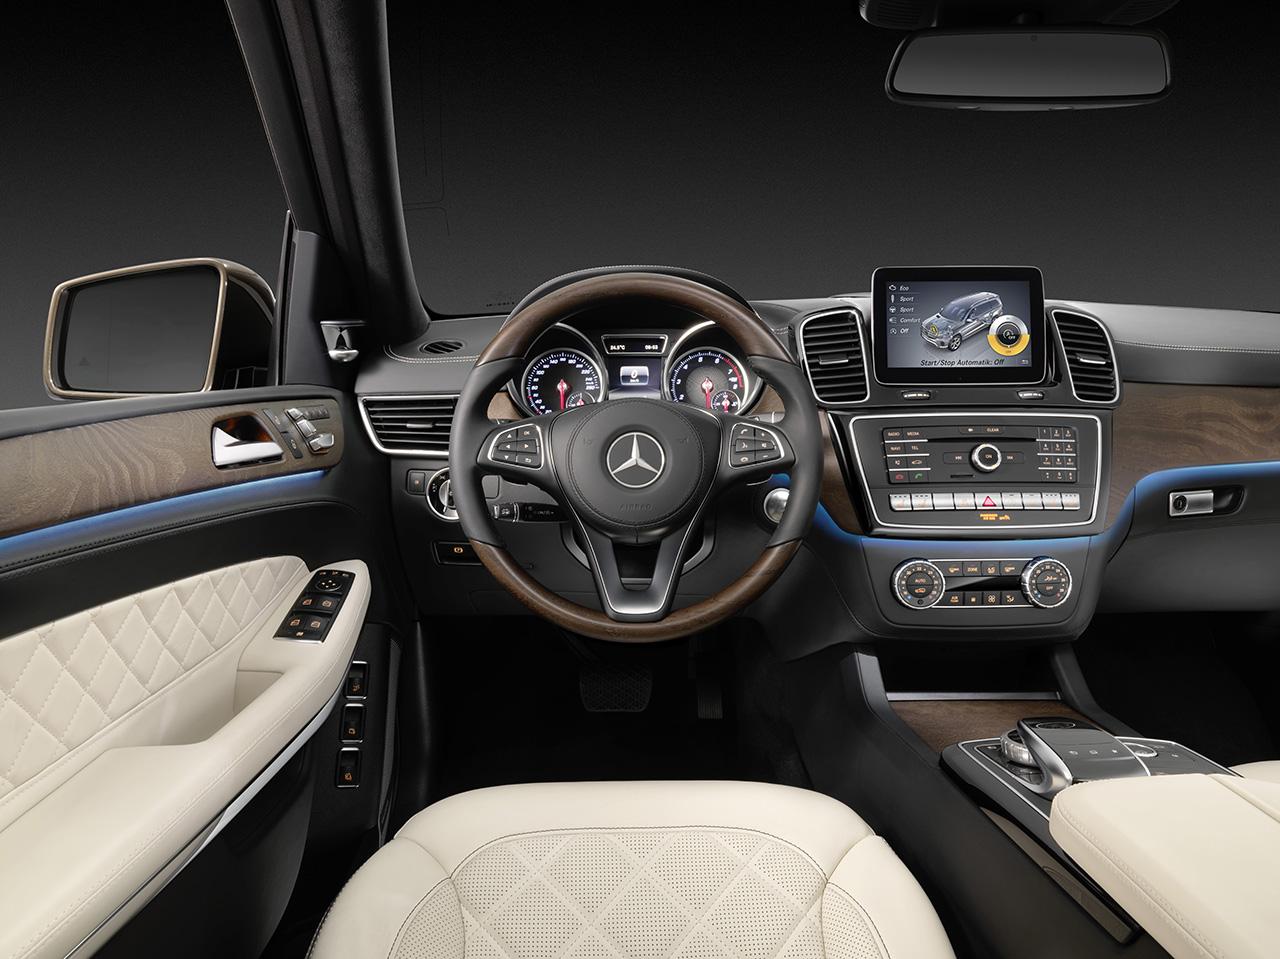 mercedes amg gt moreover bmw new car 2017 additionally new m gane gt